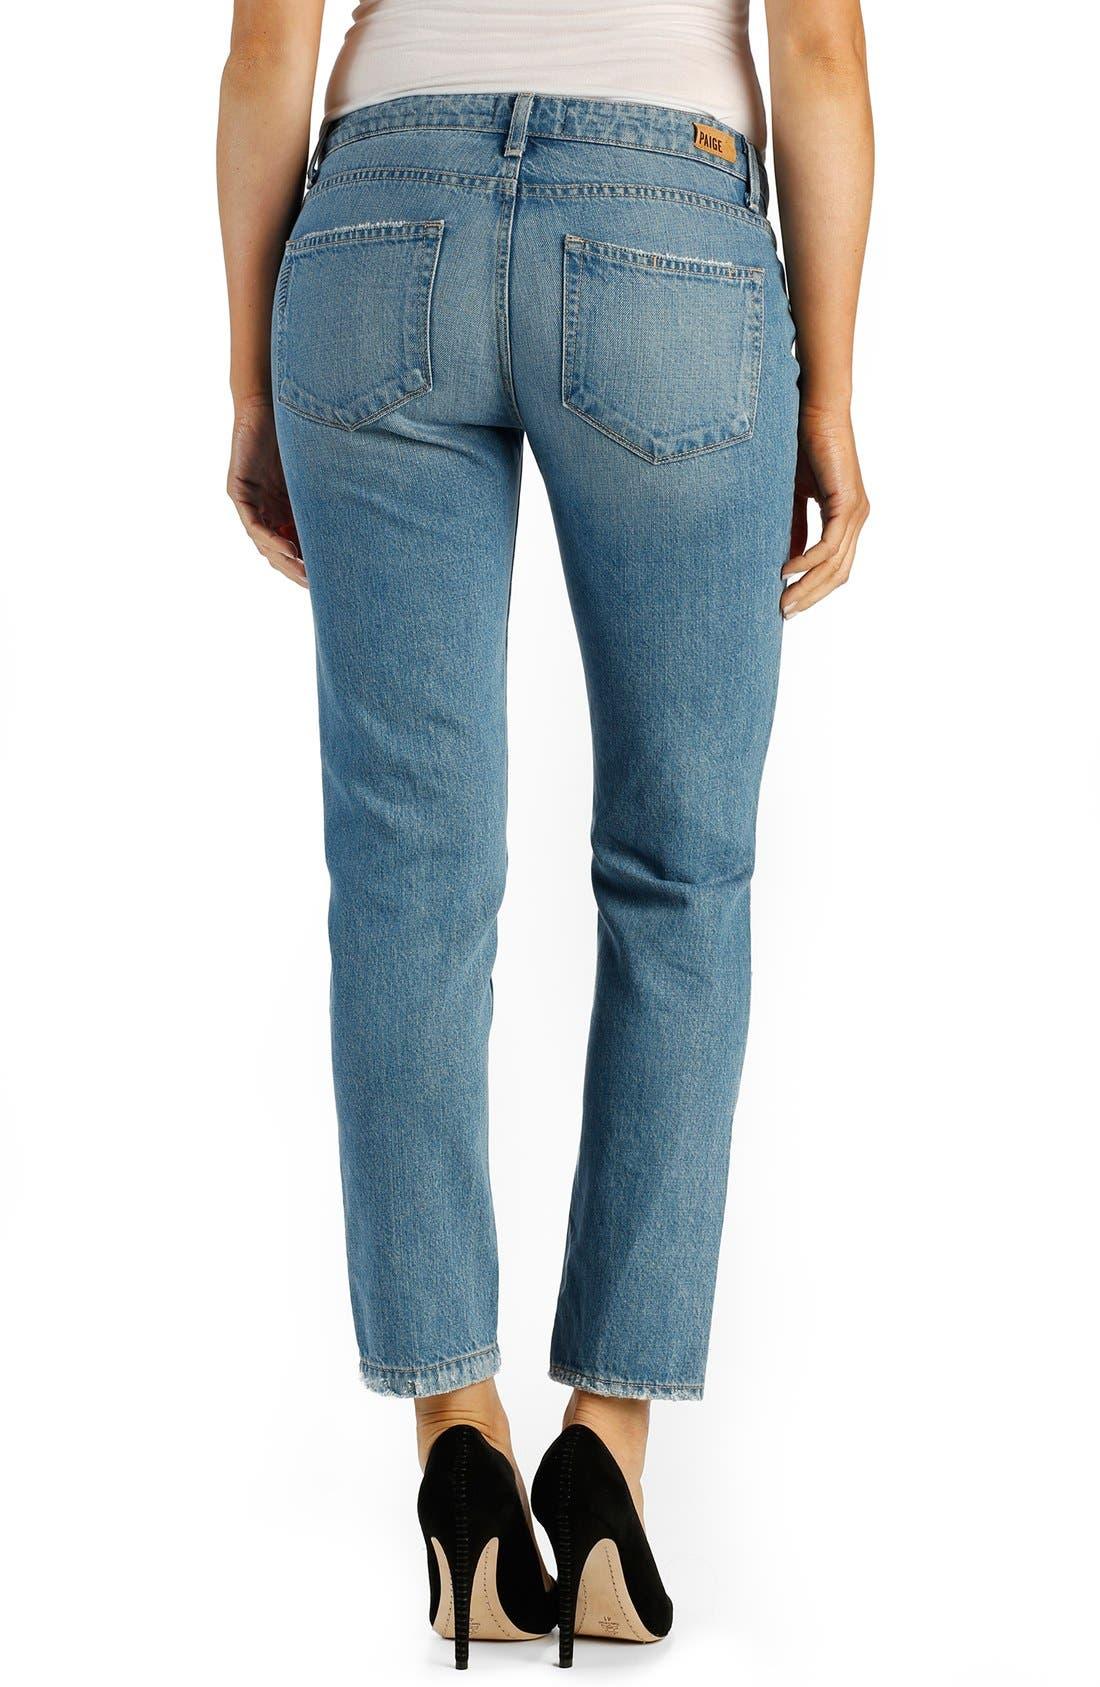 PAIGE, Denim 'Jimmy Jimmy' Ankle Boyfriend Skinny Jeans, Alternate thumbnail 2, color, 400